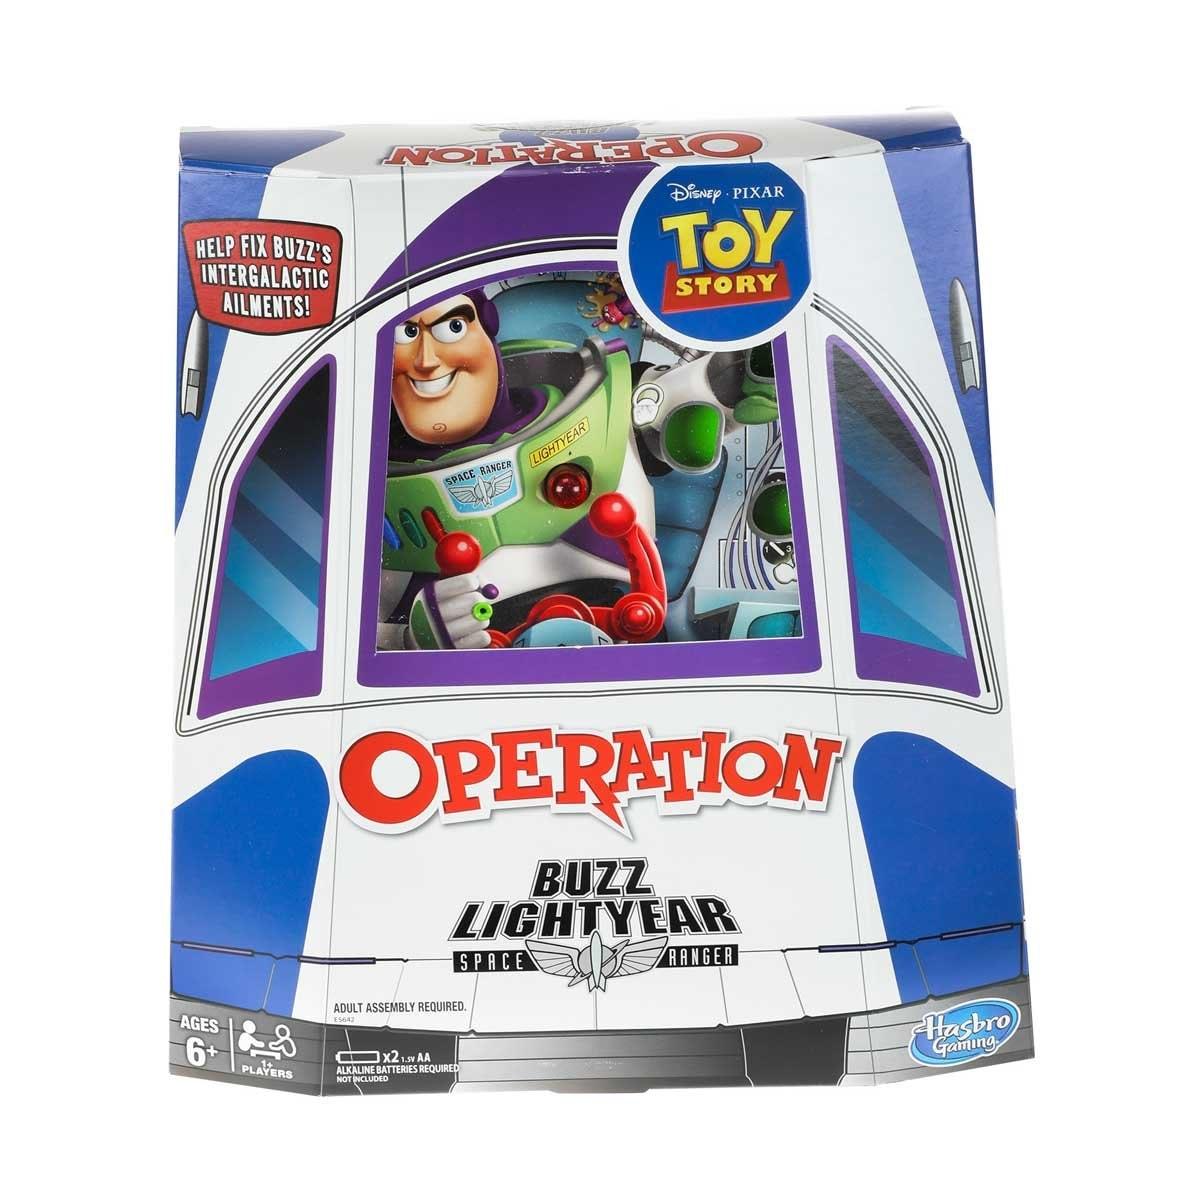 Operando Buzz Lightyear Toy Story Hasbro